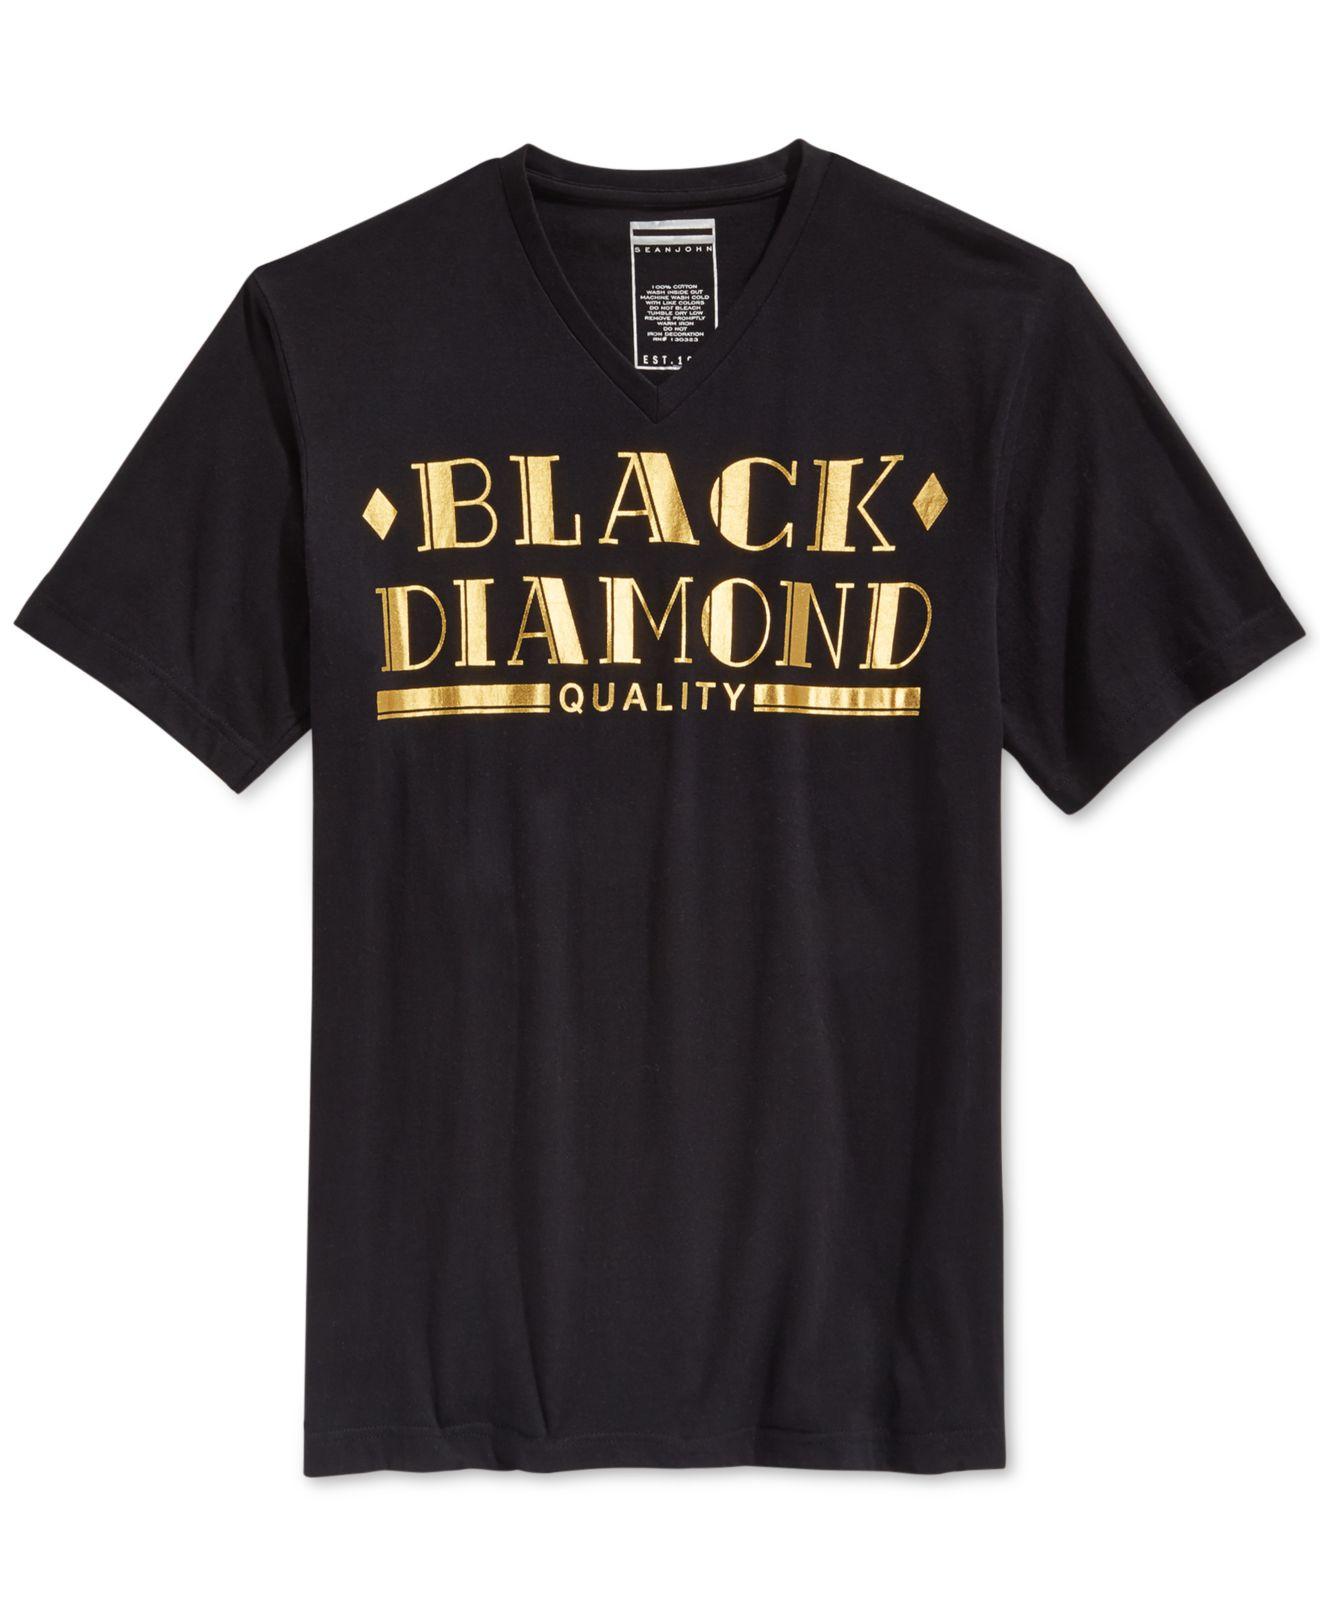 Lyst sean john men 39 s black diamond t shirt in black for men for Sean john t shirts for mens